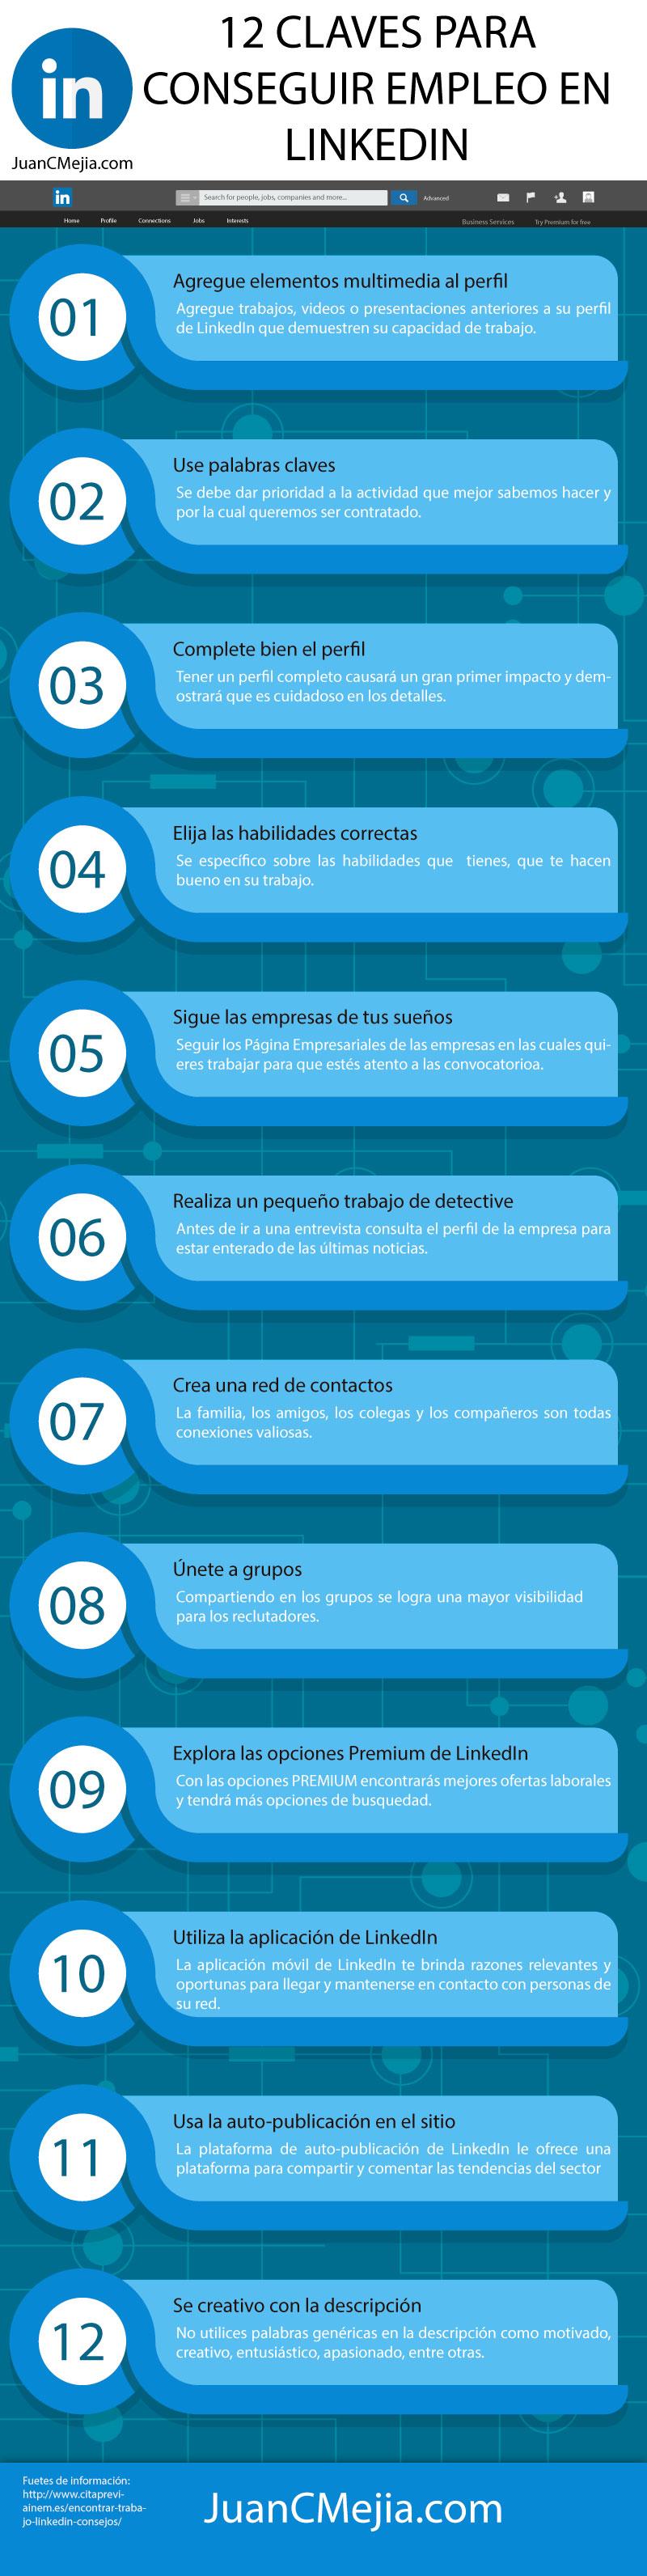 Como encontrar trabajo con LinkedIn Infografia en español